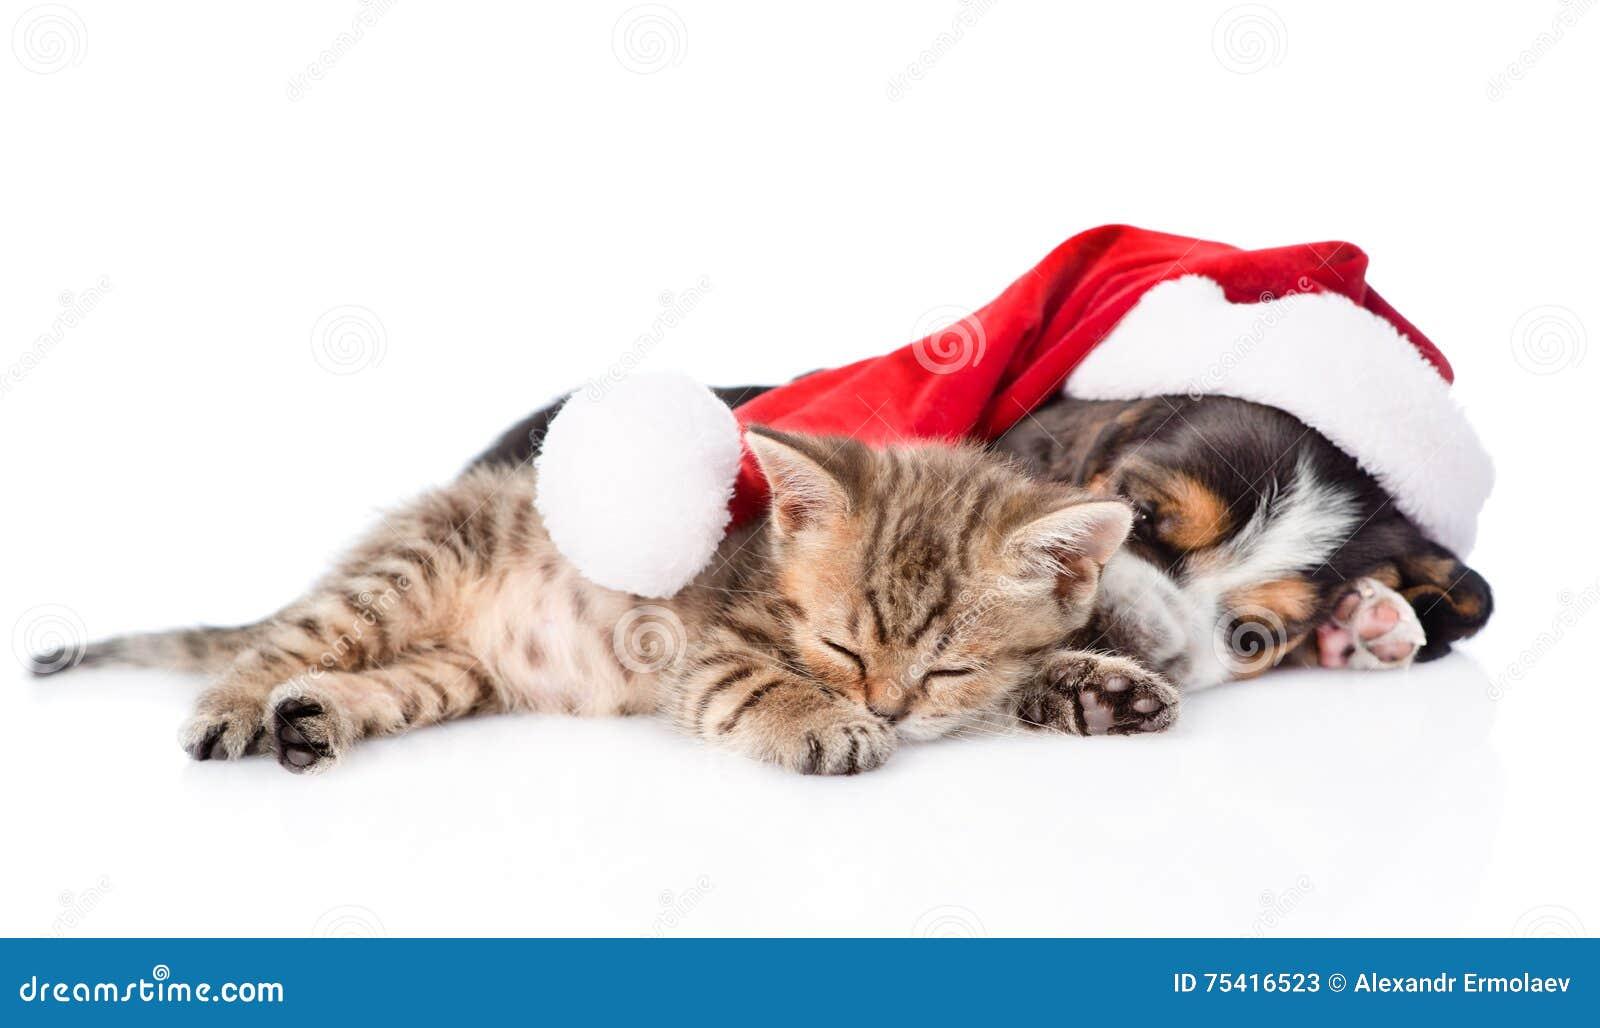 Tiny kitten and basset hound puppy in red santa hat sleeping tog